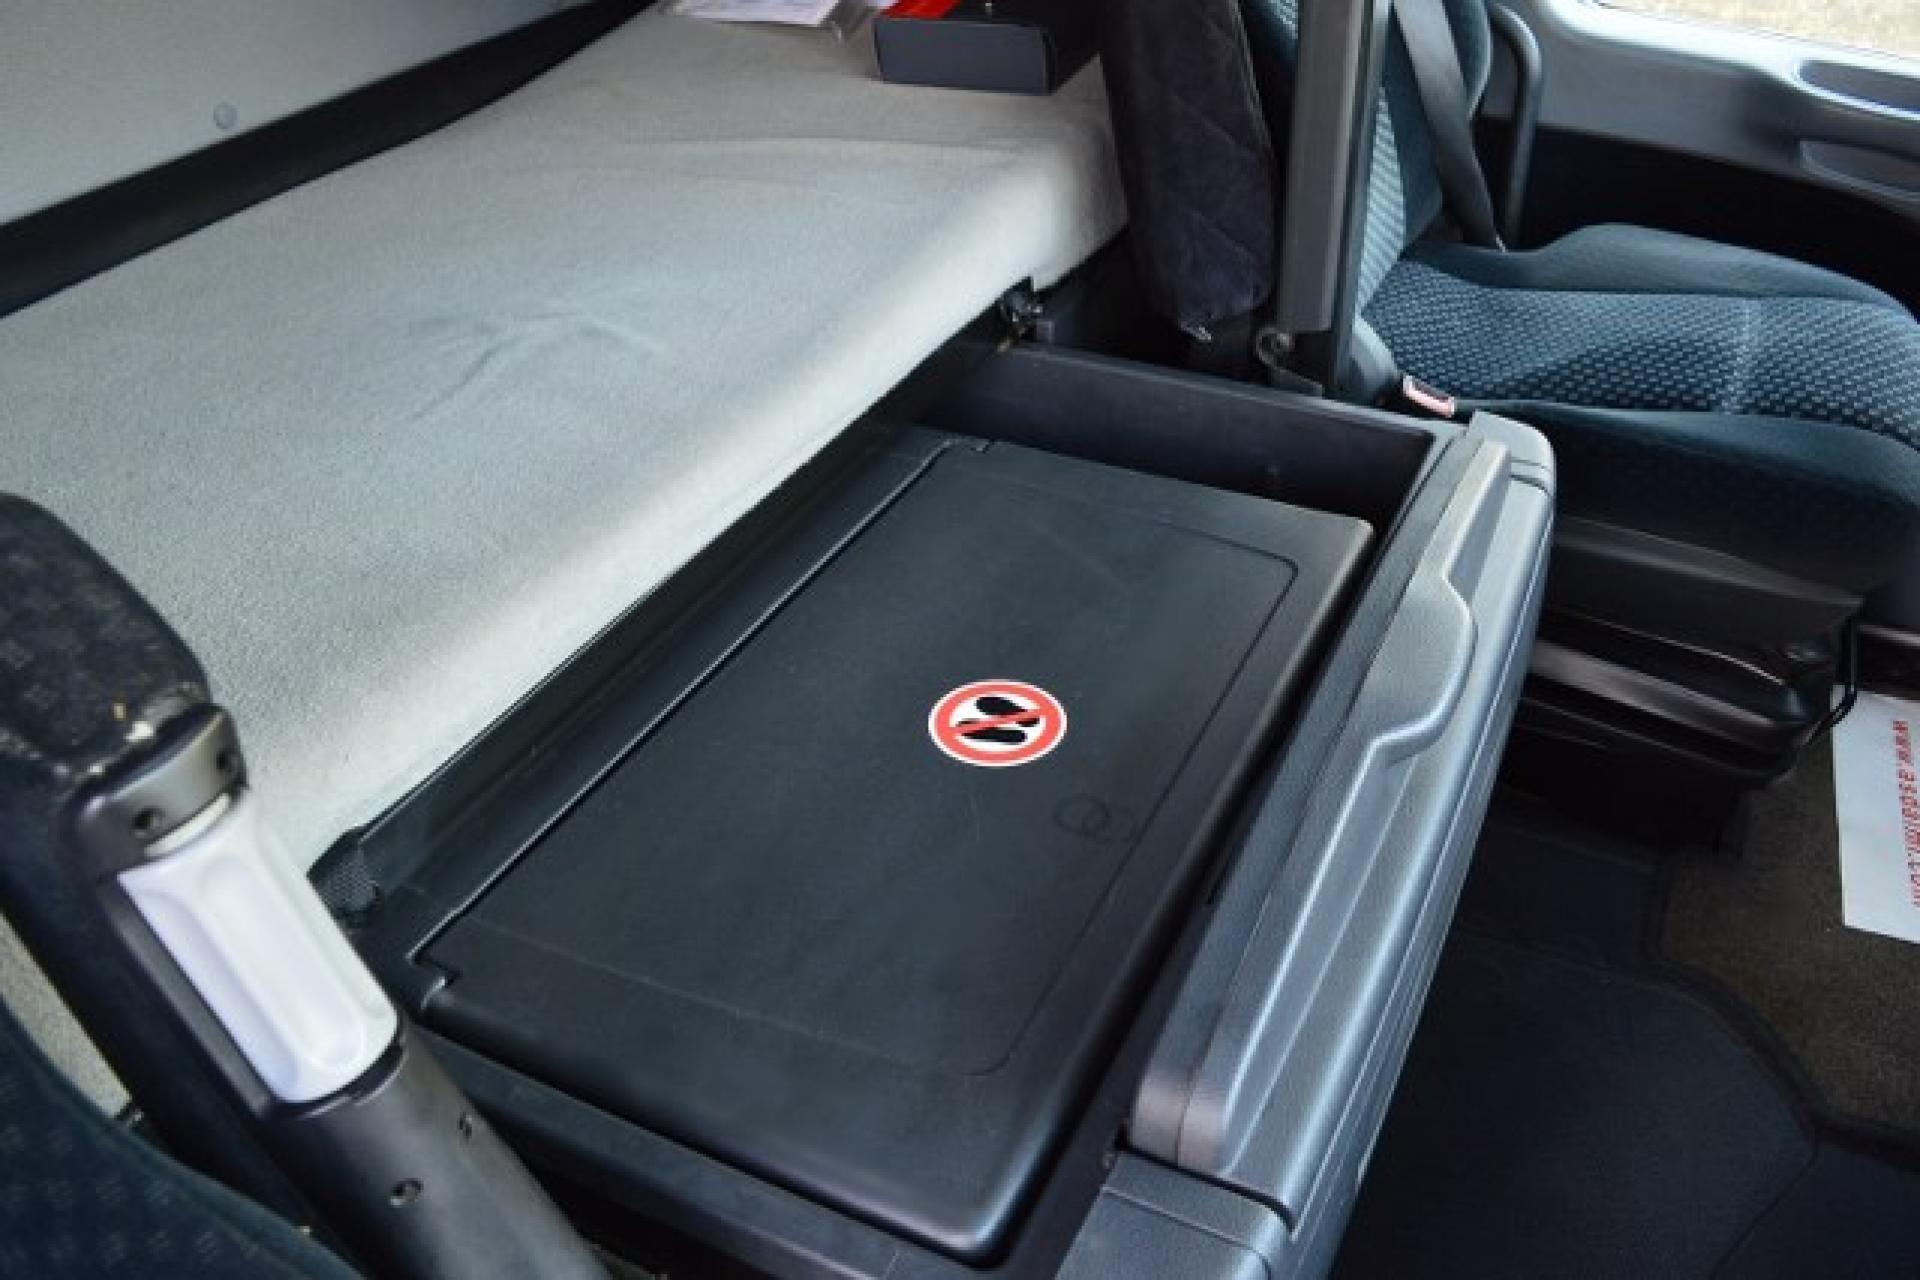 Mercedes-Benz Actros Mp3 1841 BlueTEC 5 MegaSpace Automatik BDF Hladnjača Termo King -32/+32 RETARDER Bi-Xenon + LED Safety MAX-VOLL -New Modell 2010-